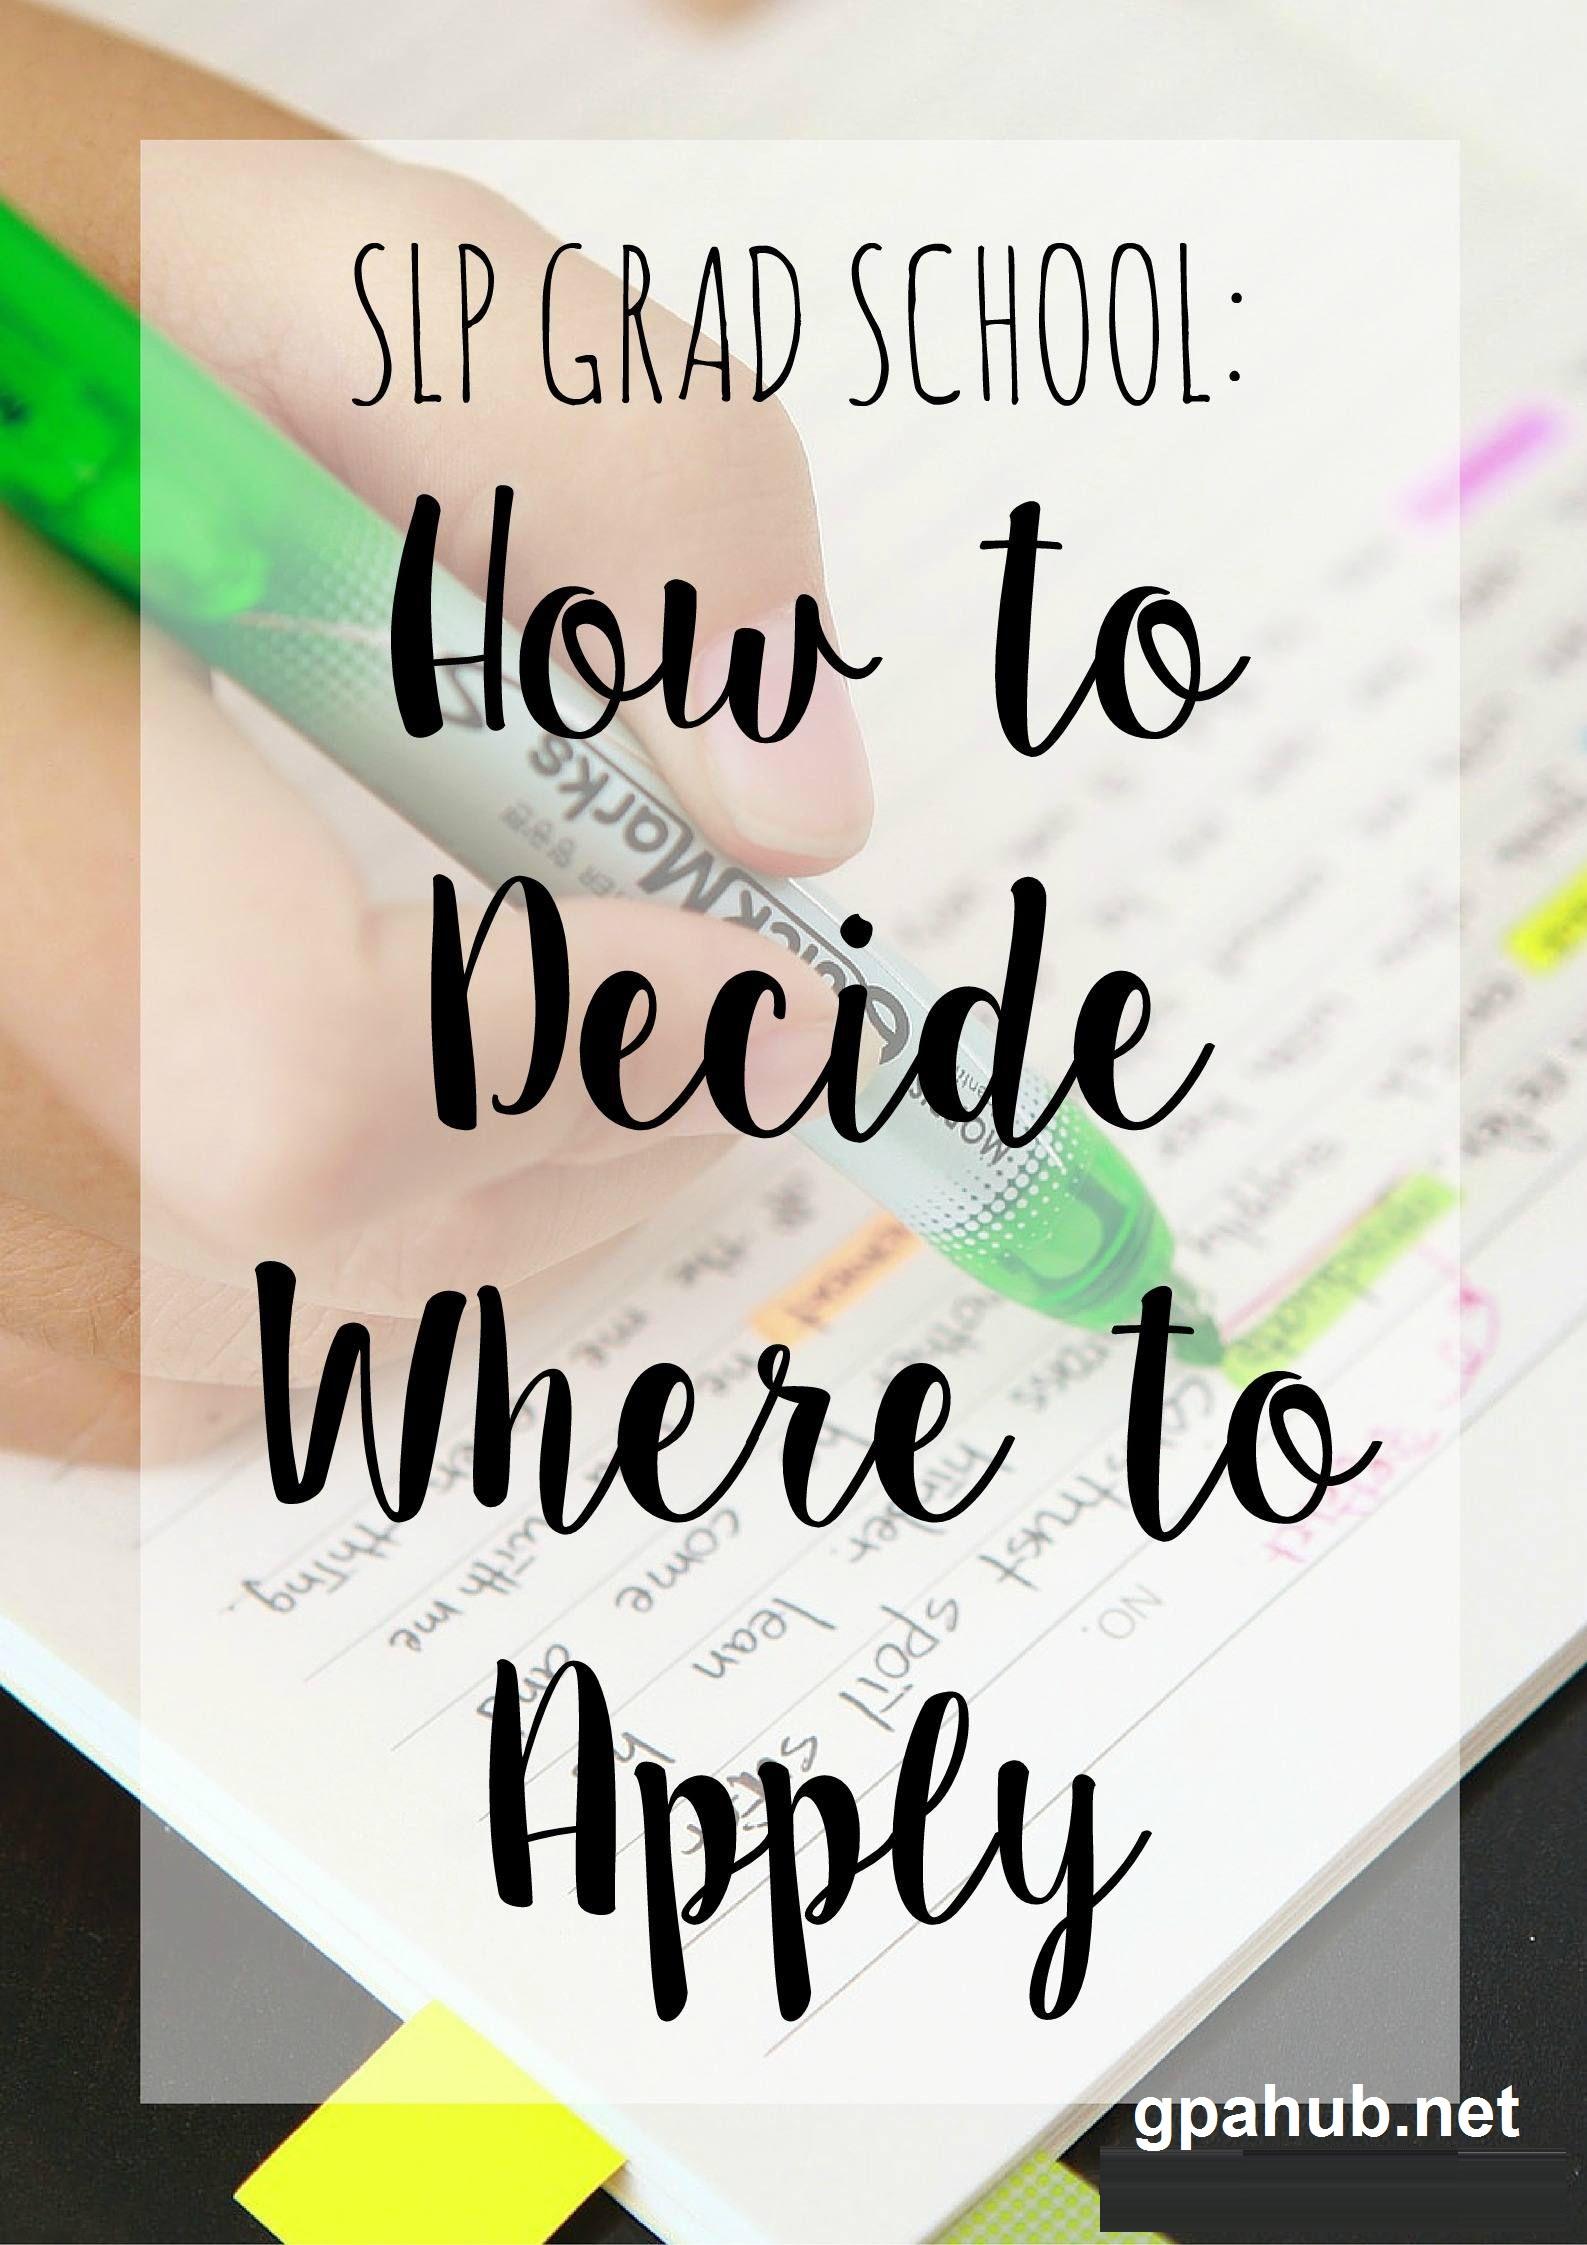 How many graduate schools should I apply to